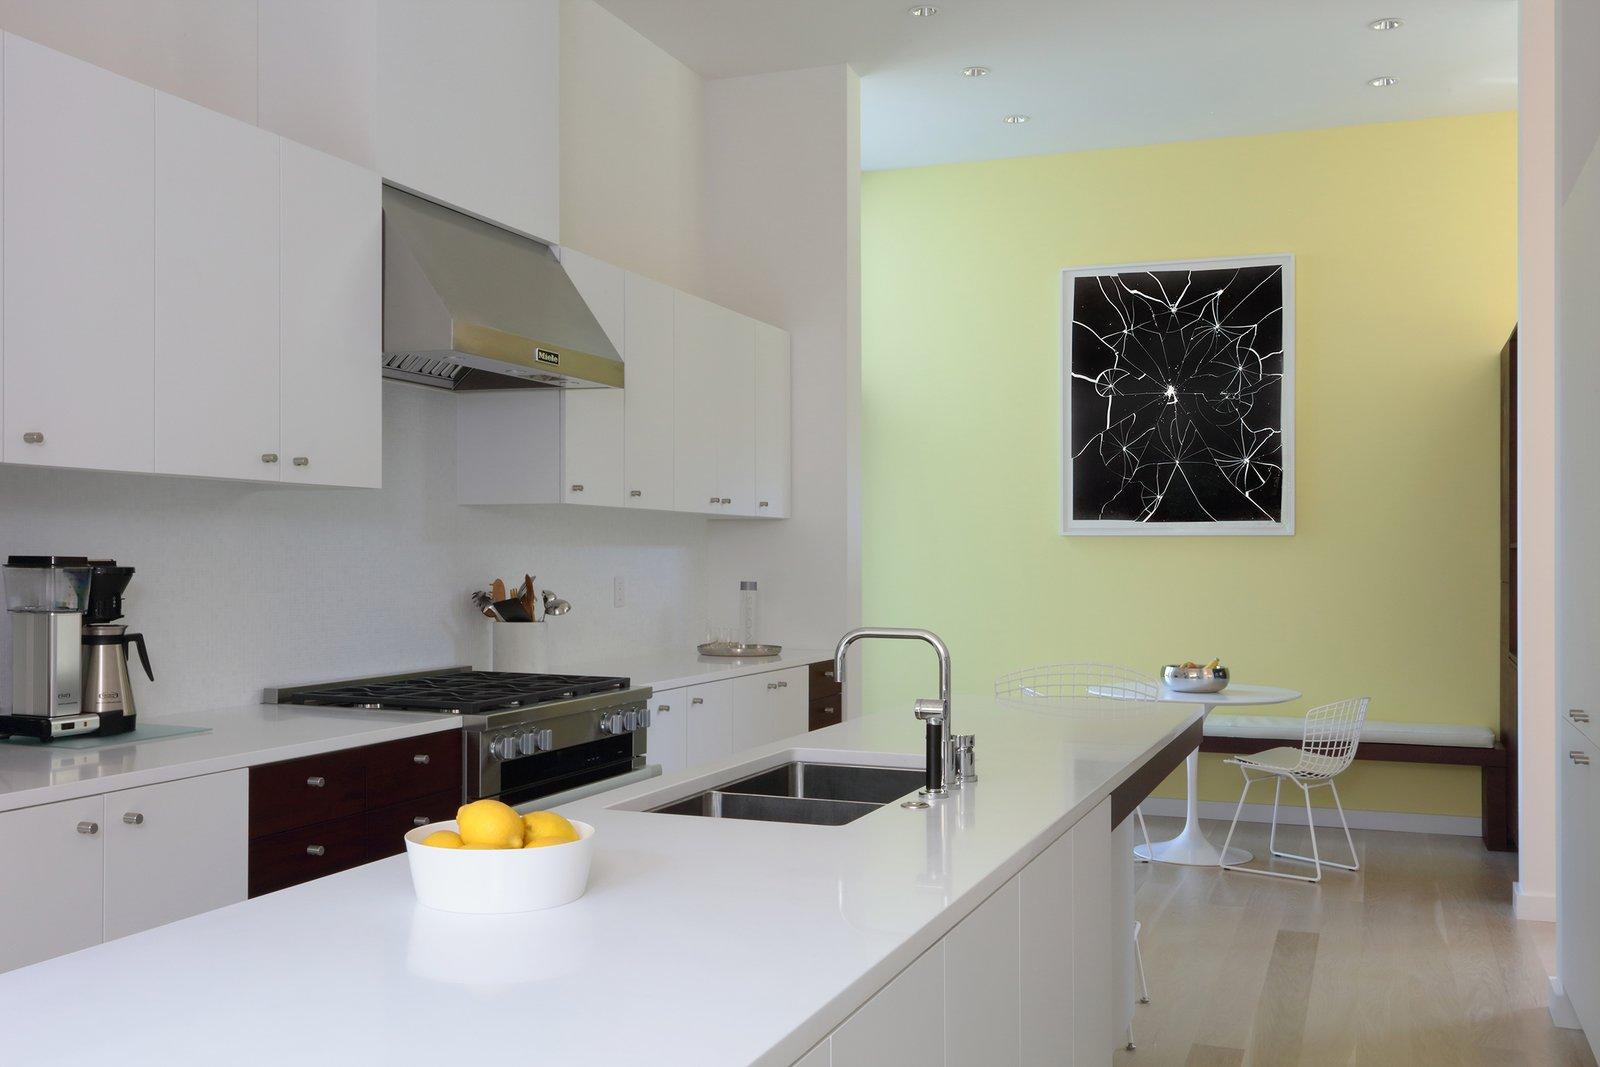 Kitchen, Engineered Quartz Counter, Light Hardwood Floor, White Cabinet, Wood Cabinet, Glass Tile Backsplashe, Ceiling Lighting, Range, Range Hood, and Undermount Sink Kitchen  The Hearn House